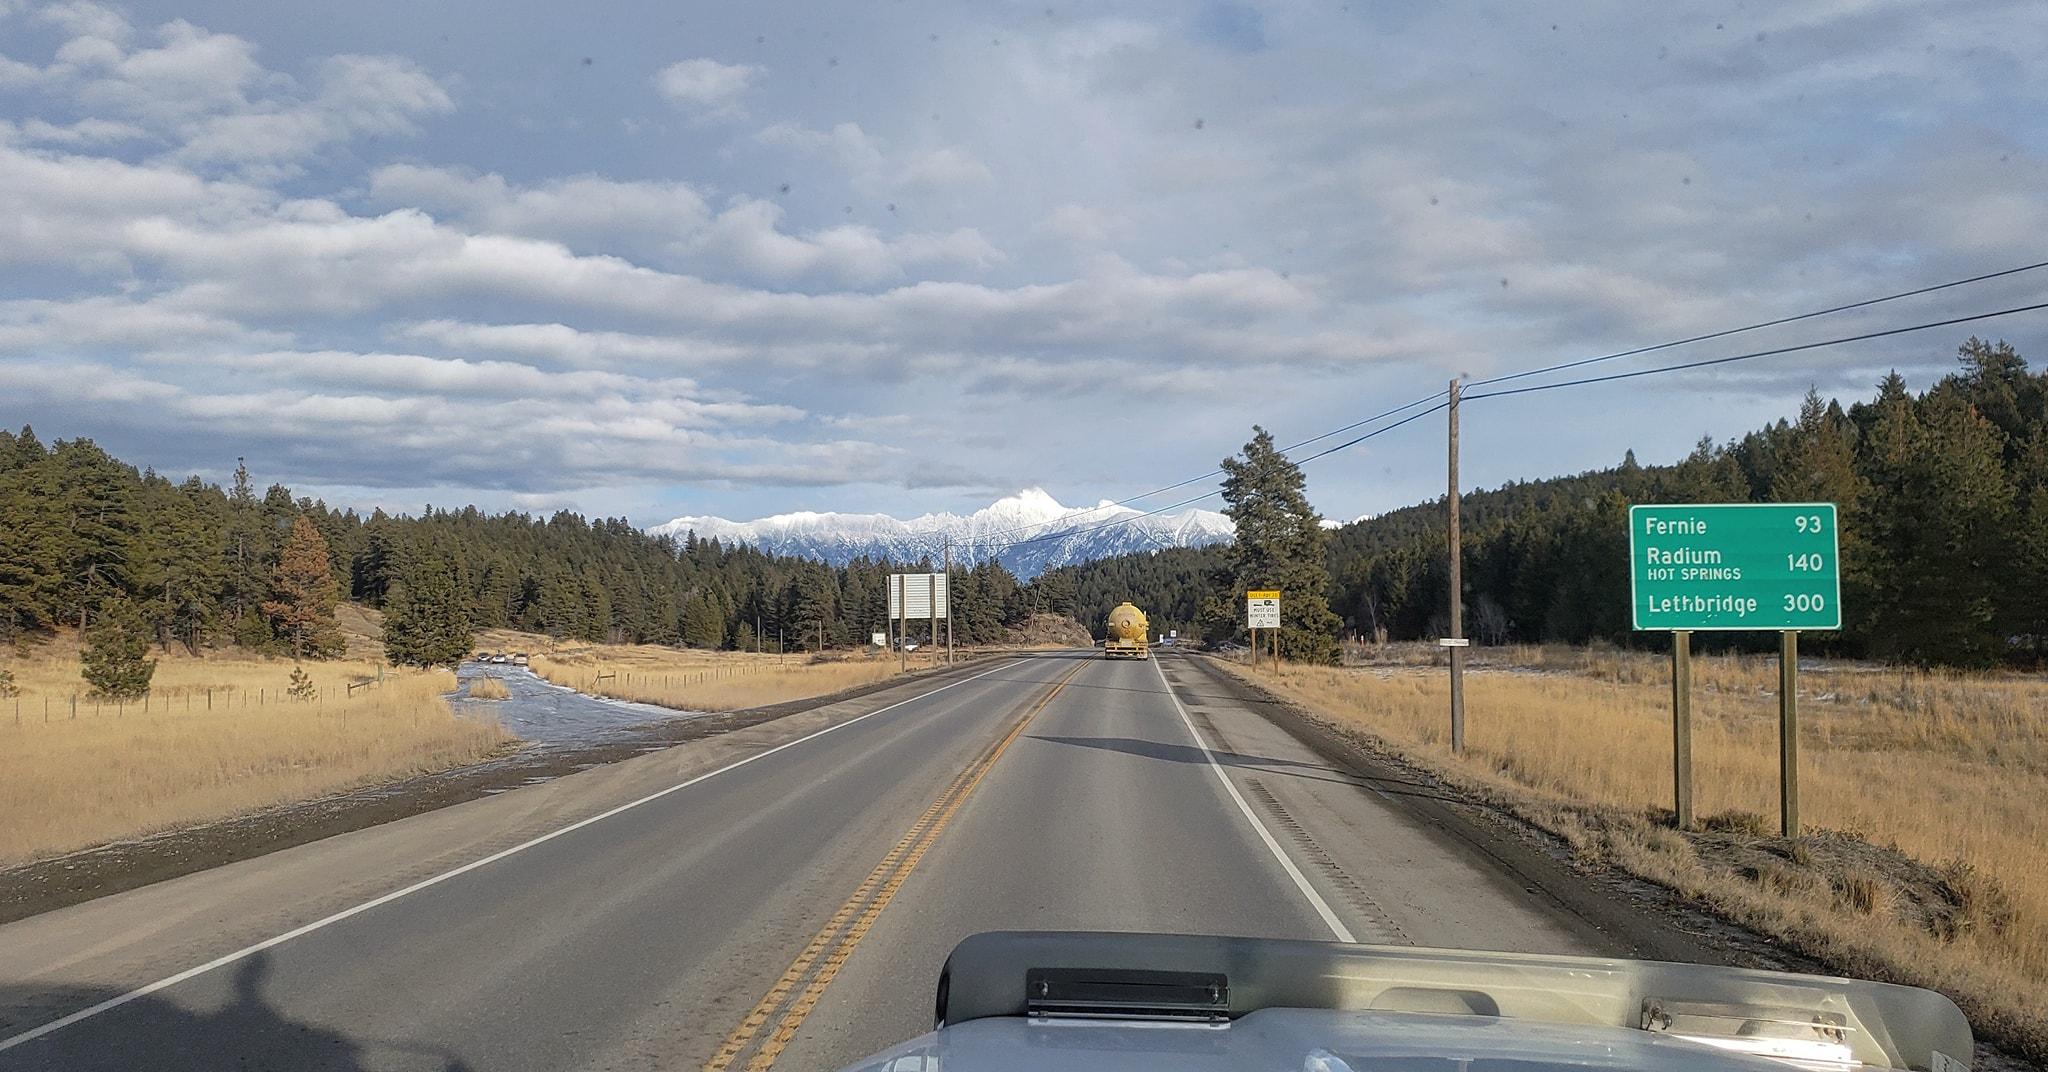 6-1-2019-rondreis-van-2800-km-Montana-Idaho-Oregon-Washington-(1)